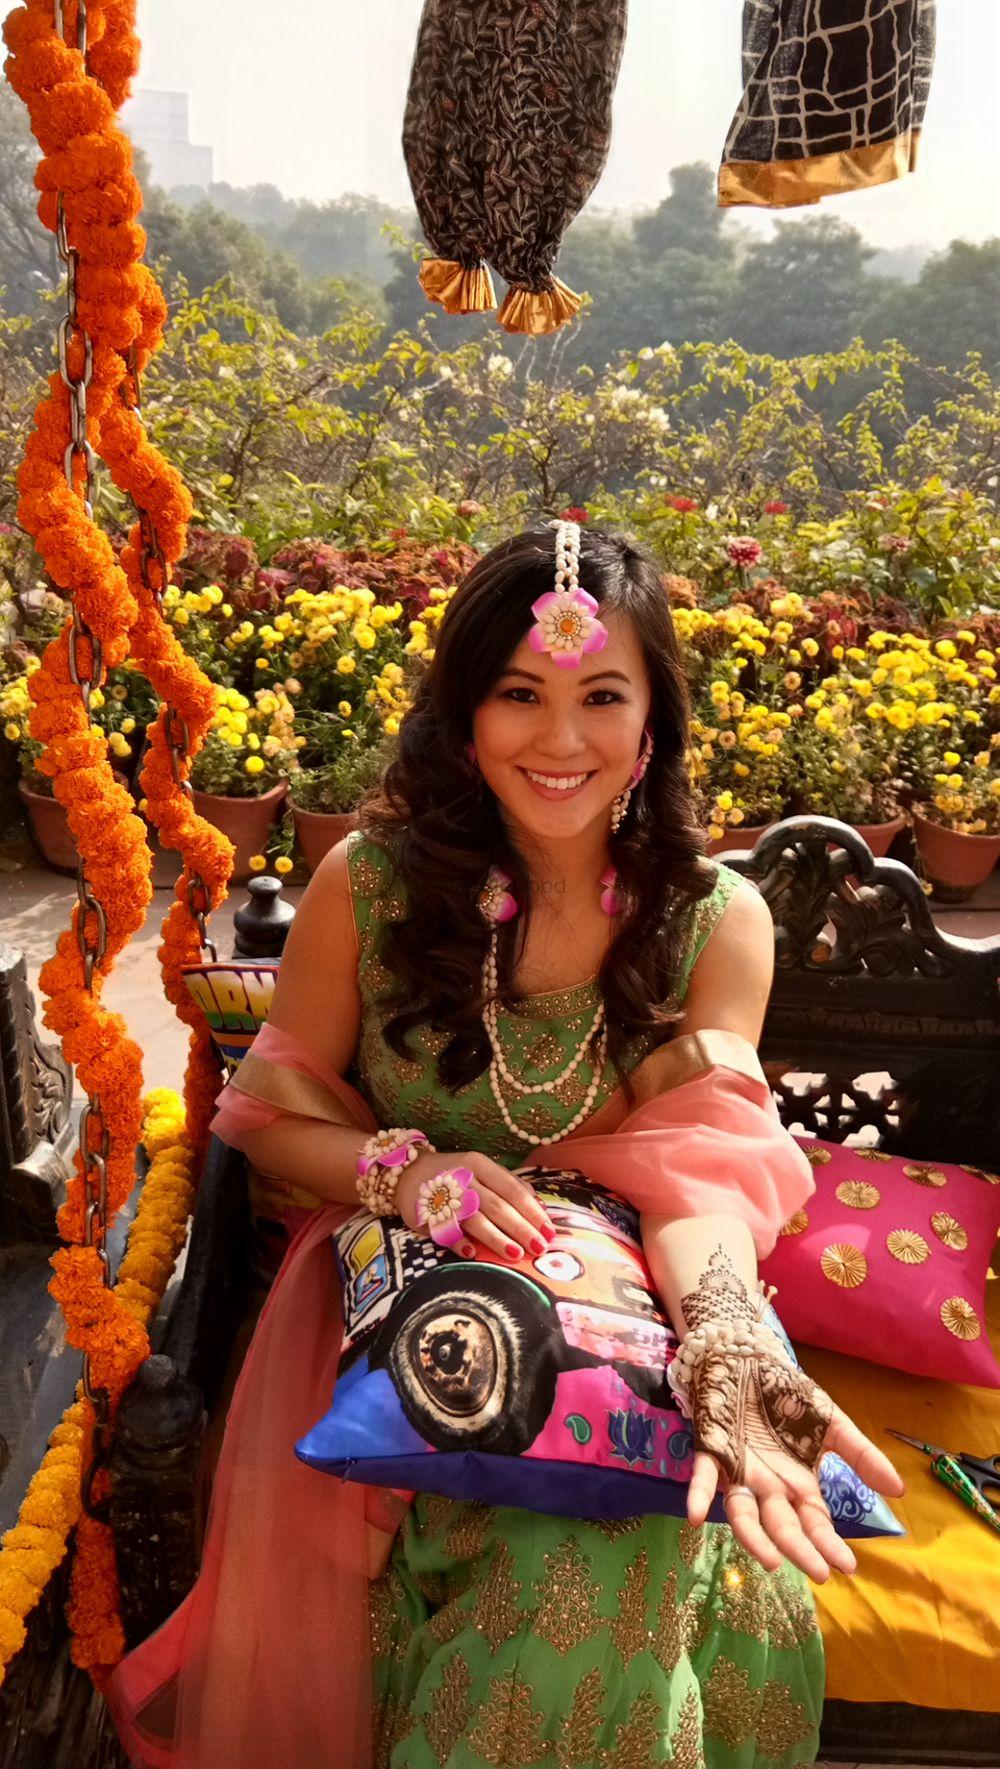 Photo From Christina and Rohit mehendi ceremony at Taj Mahal hotel, New Delhi  on 28th Dec 2017 - By Shalini Mehendi Artist